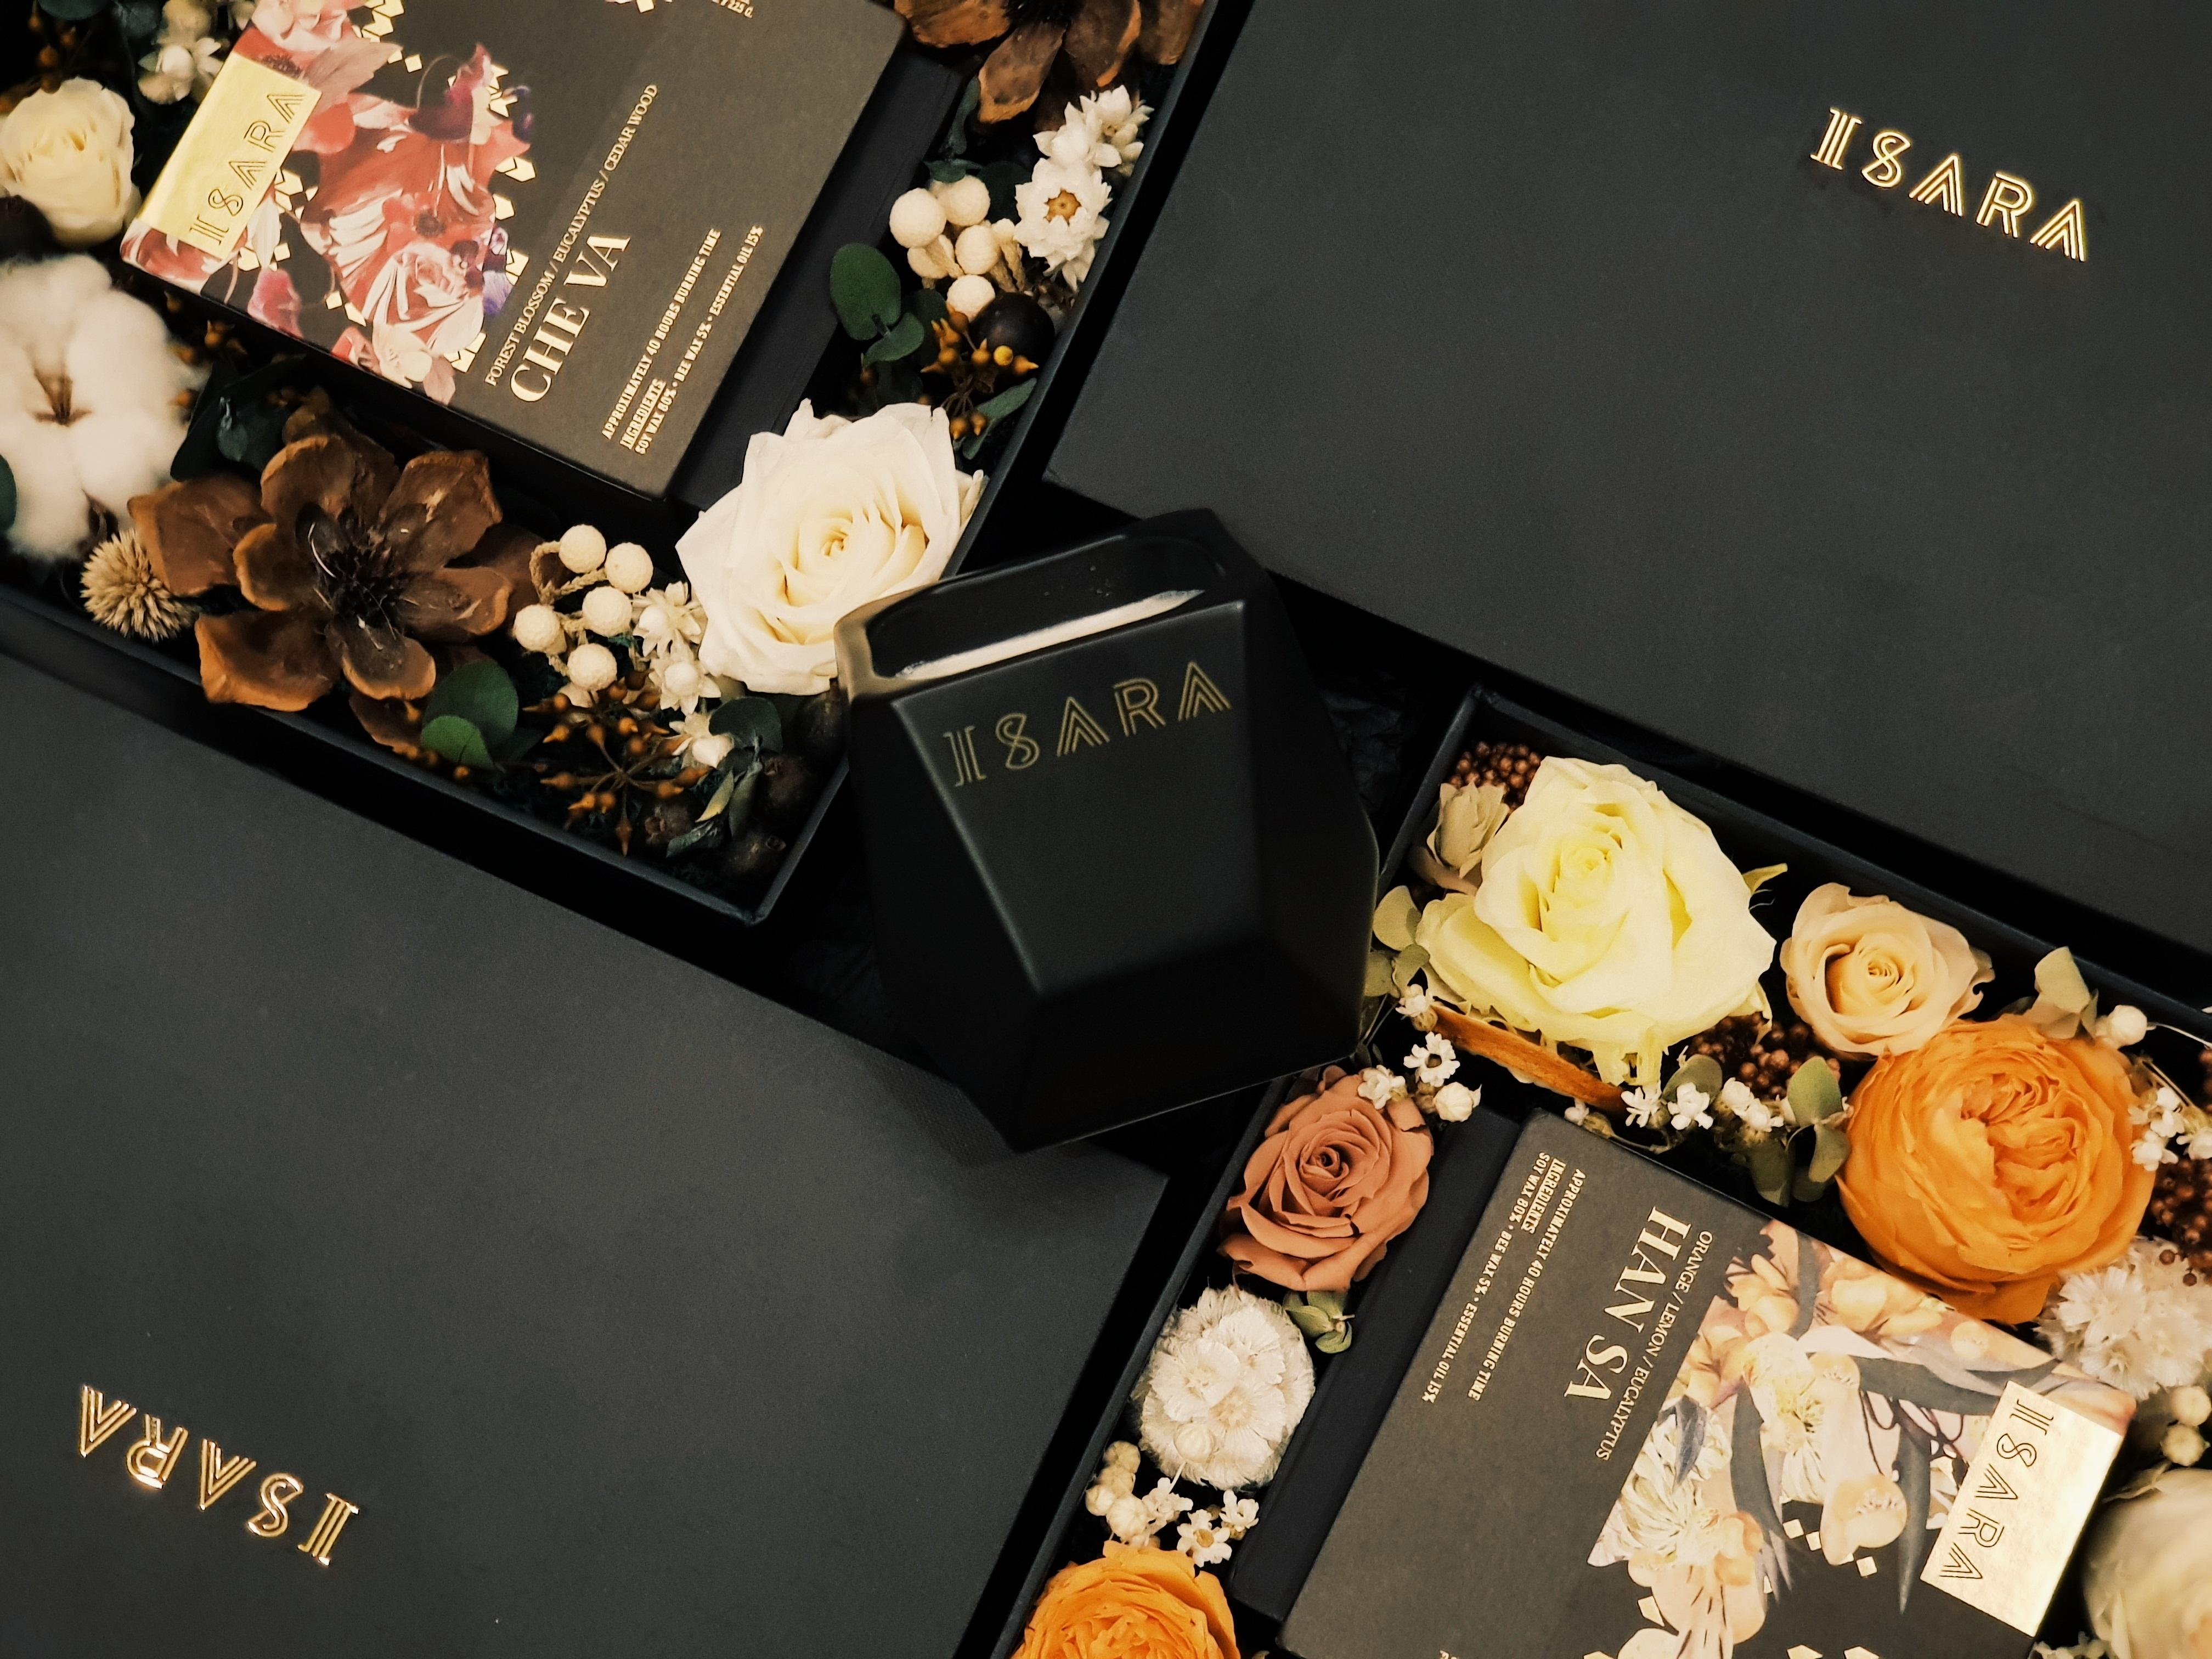 https://www.stufftaiwan.com/wp-content/uploads/2018/12/「ISARA-x賣花的老女孩」聖誕節限量禮盒